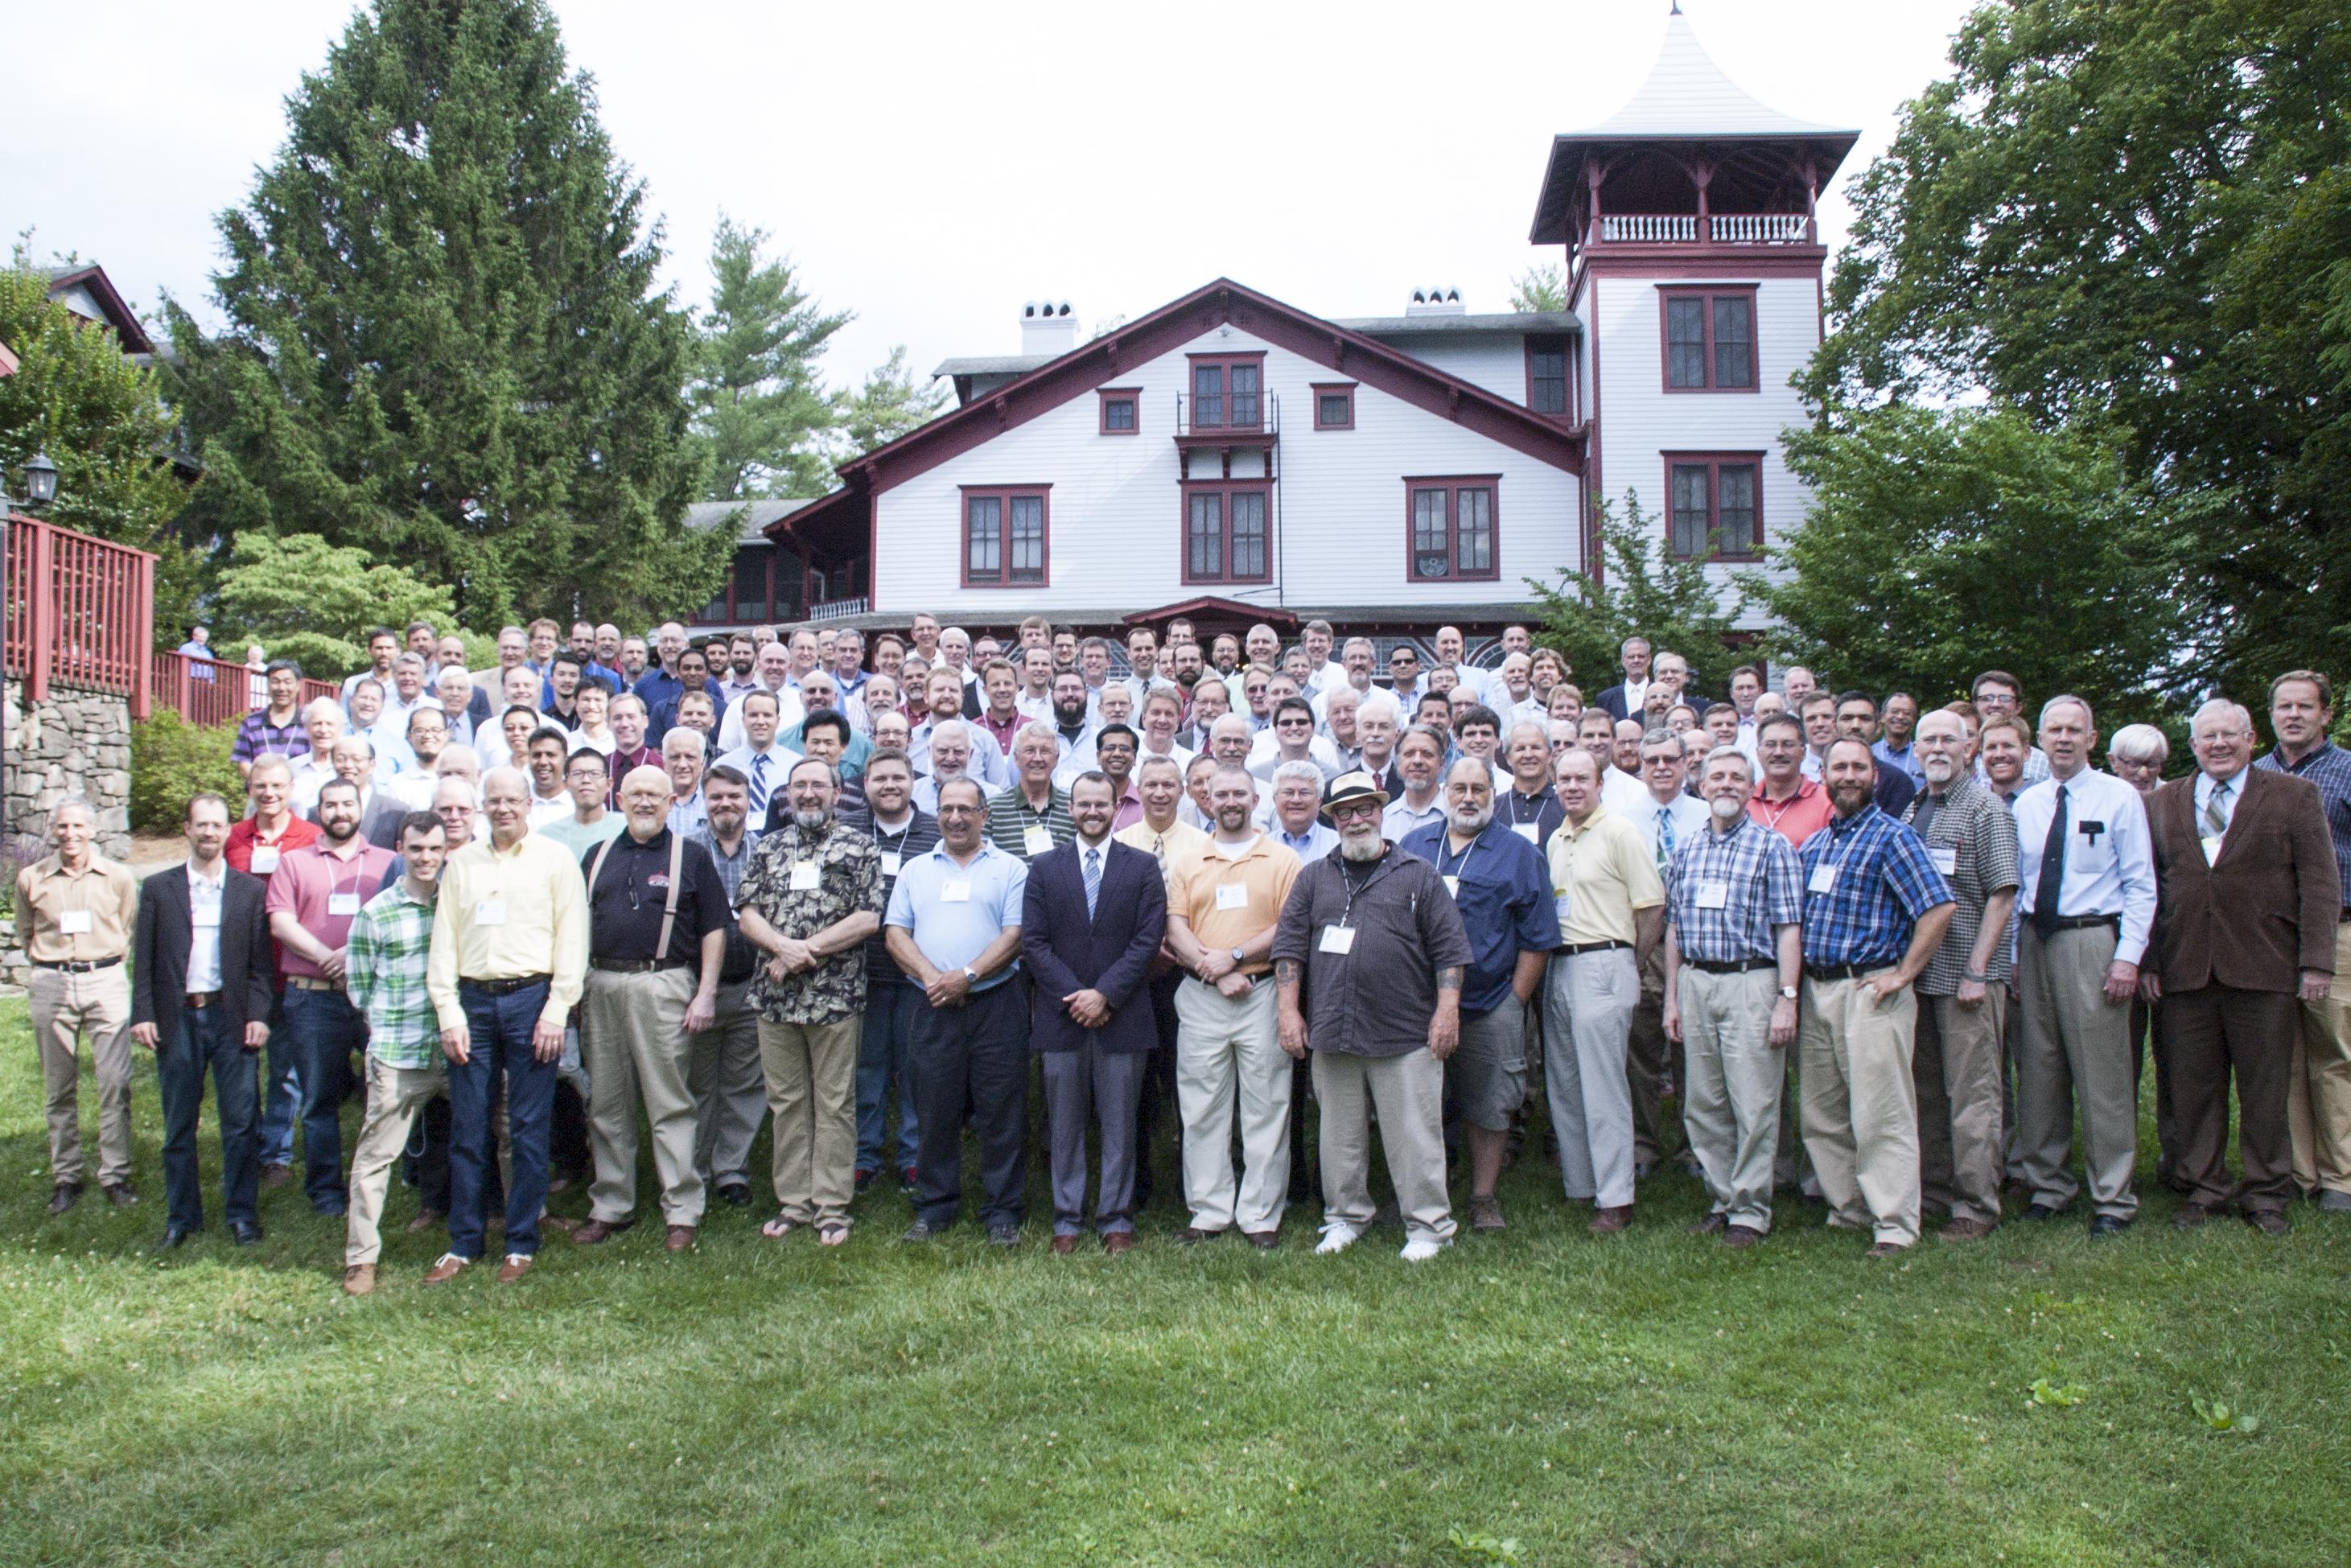 RPCNA Synod at Bonclarken Conference Center